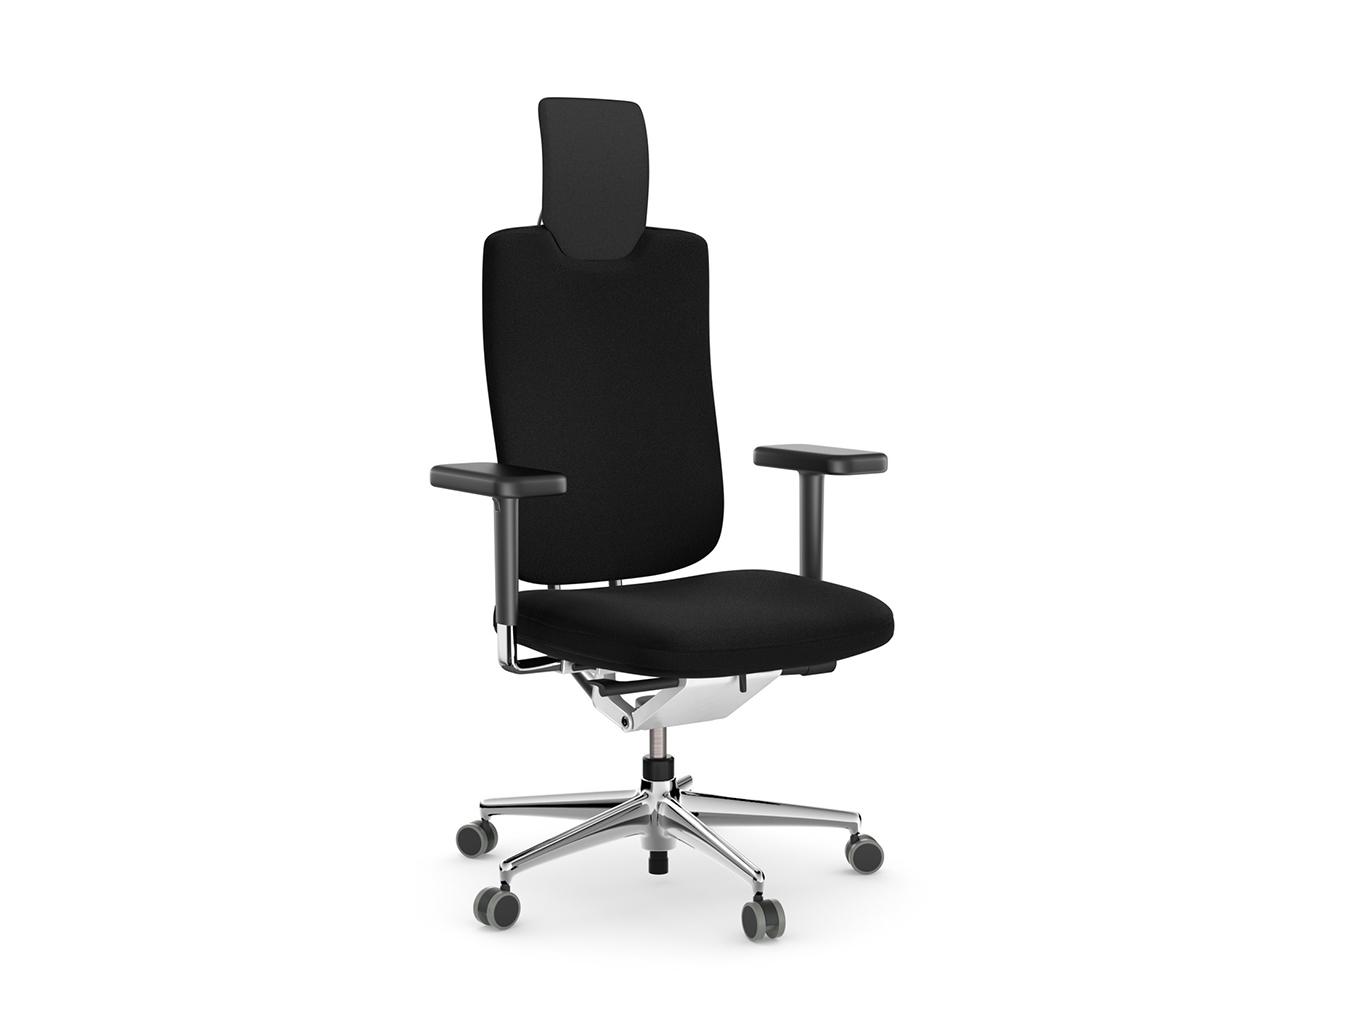 Mario & Claudio Bellini| HeadLine 大班椅 HeadLine Management Chair